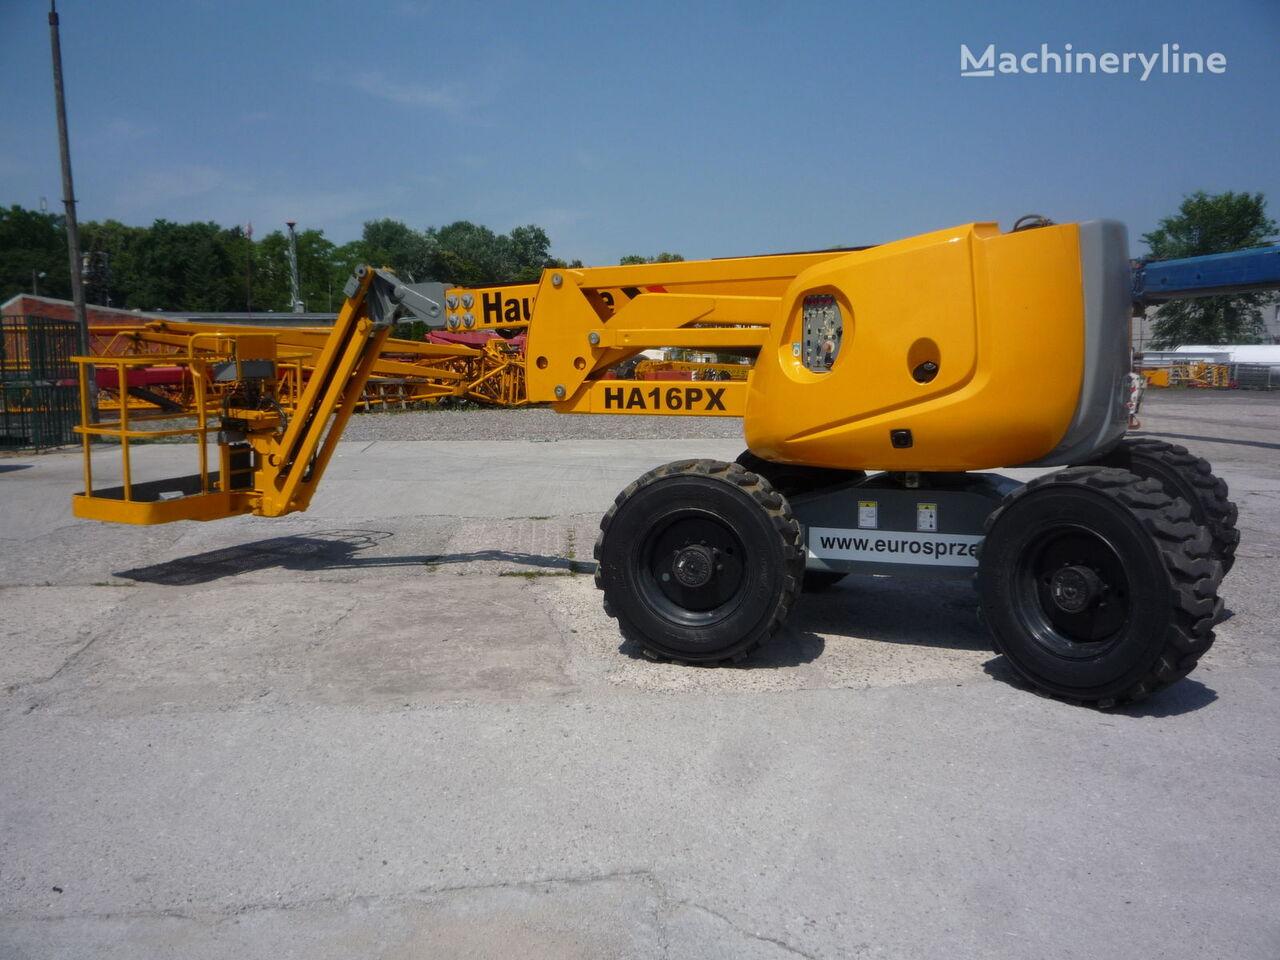 HAULOTTE HA 16 PX articulated boom lift